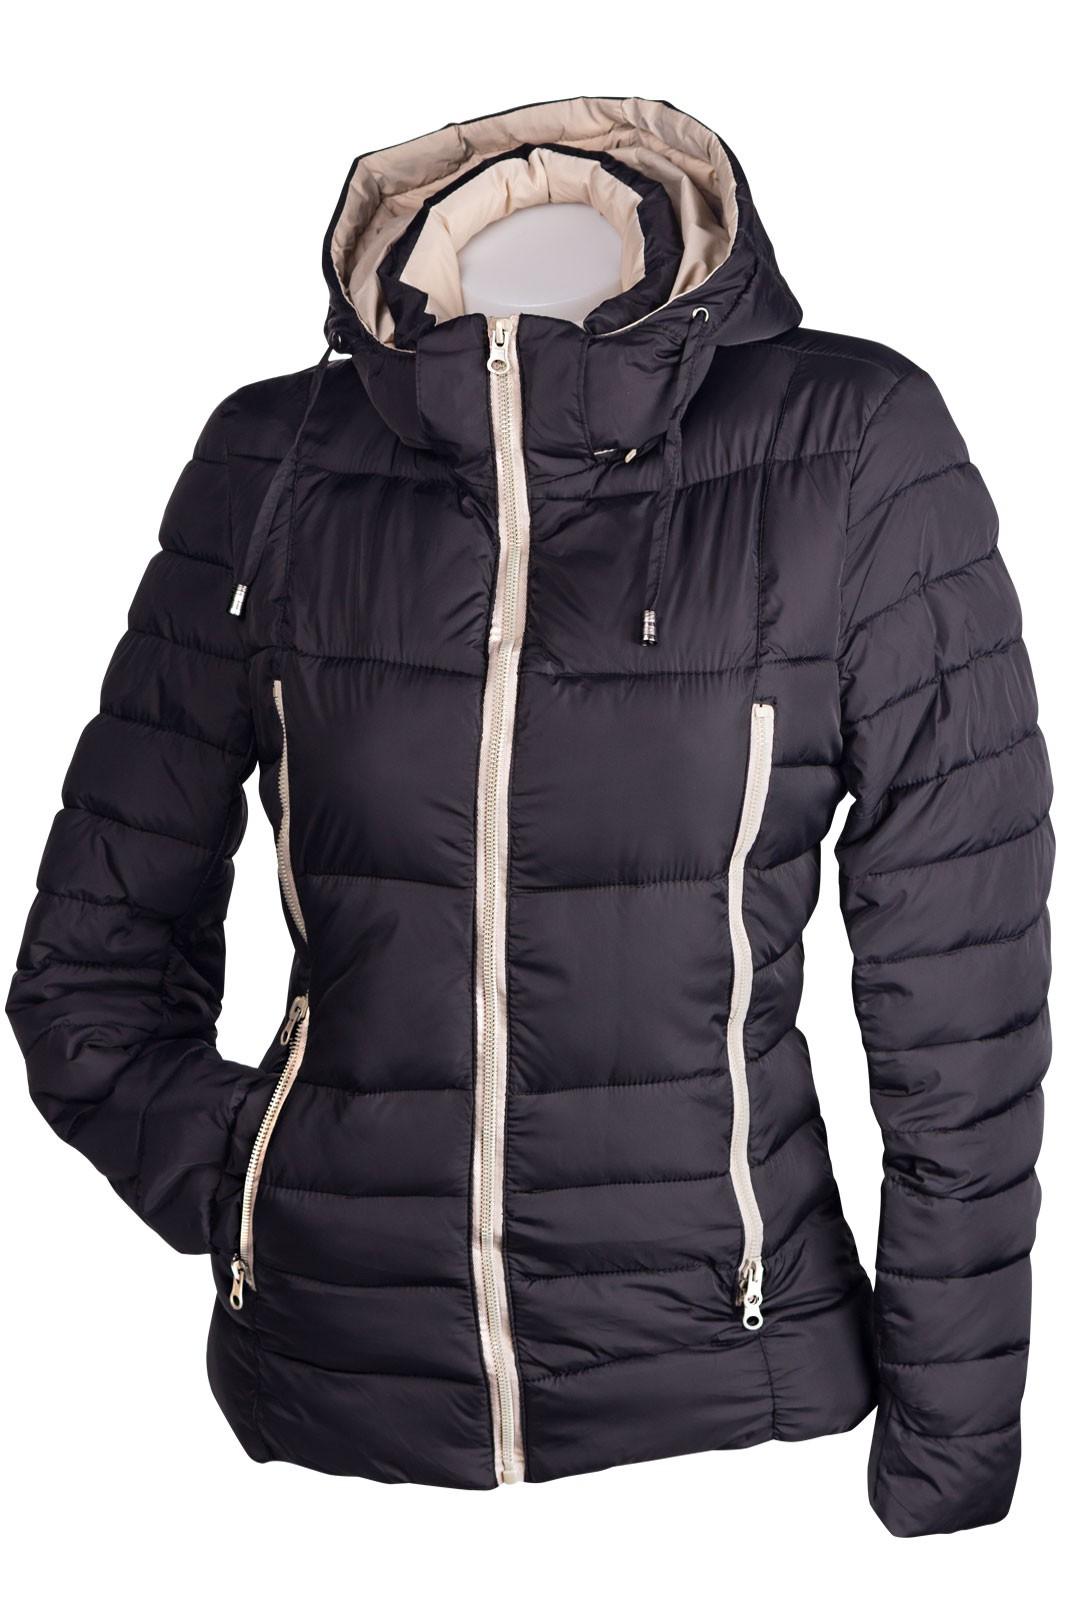 sportliche damen winterjacke mit kapuze daunen optik. Black Bedroom Furniture Sets. Home Design Ideas